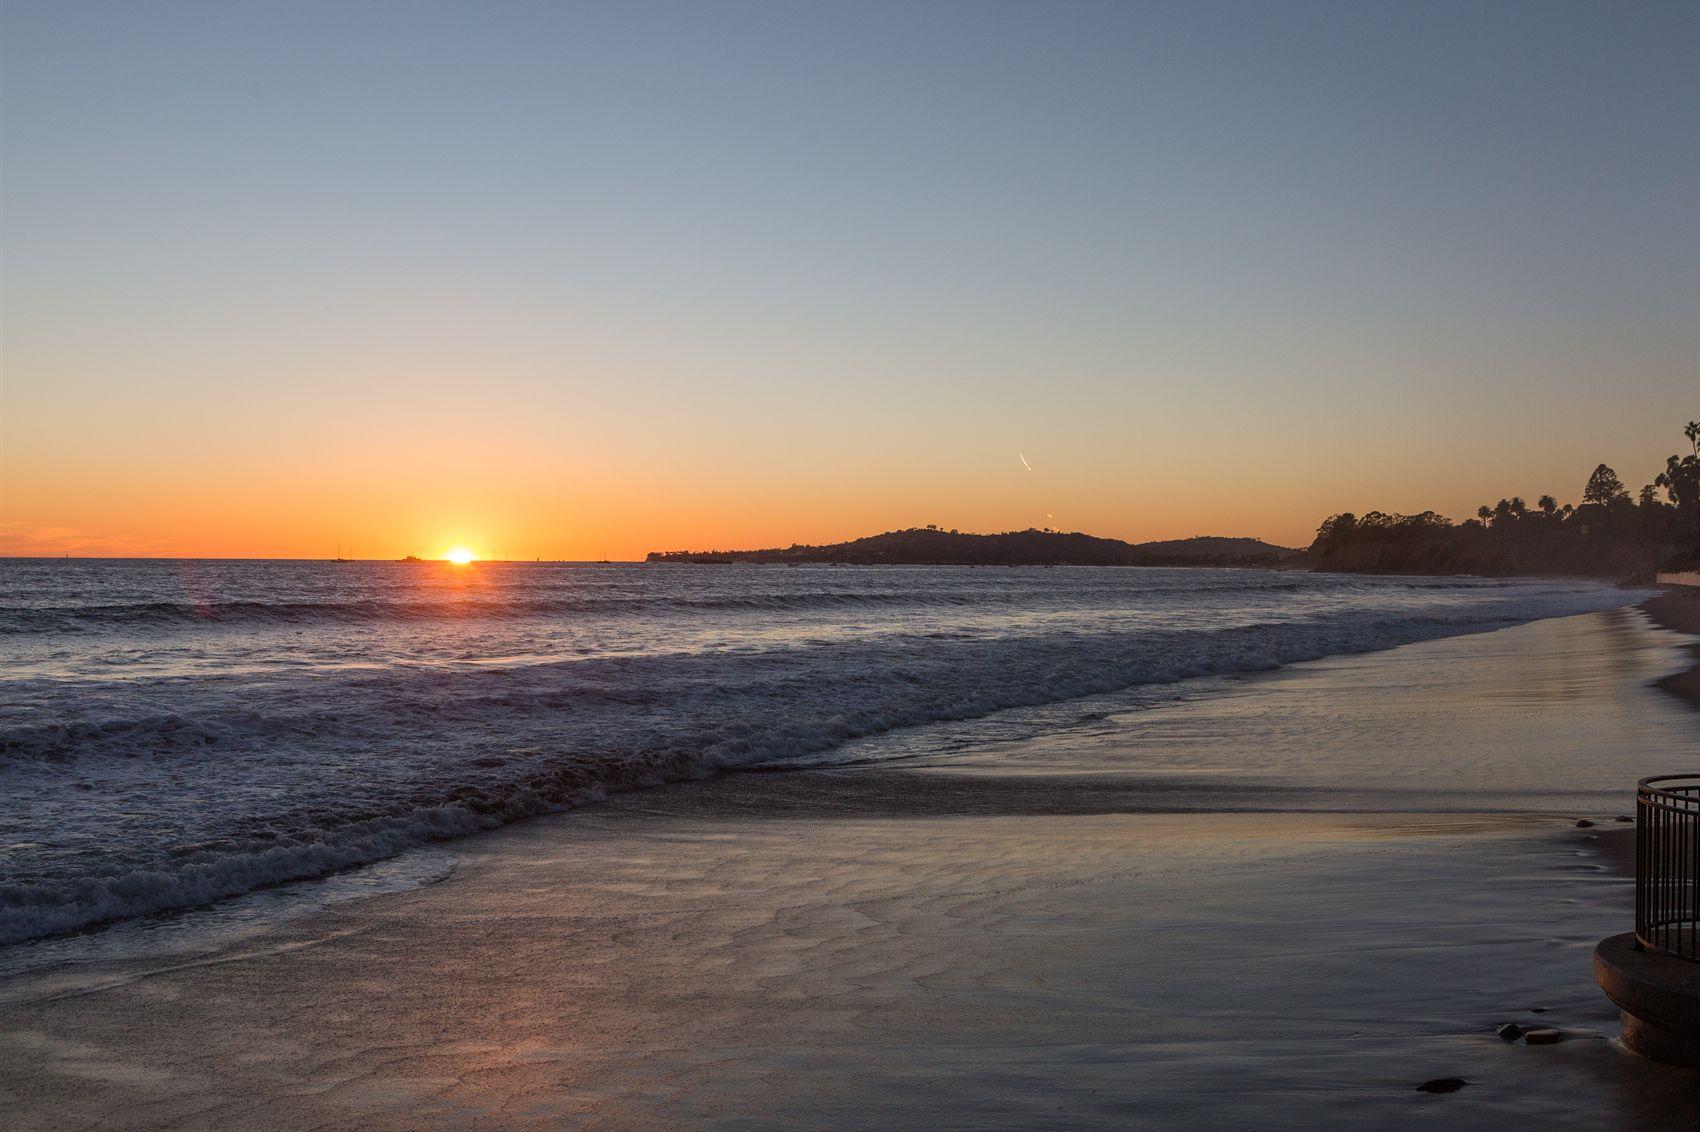 Hotels Along The Beach In Santa Barbara